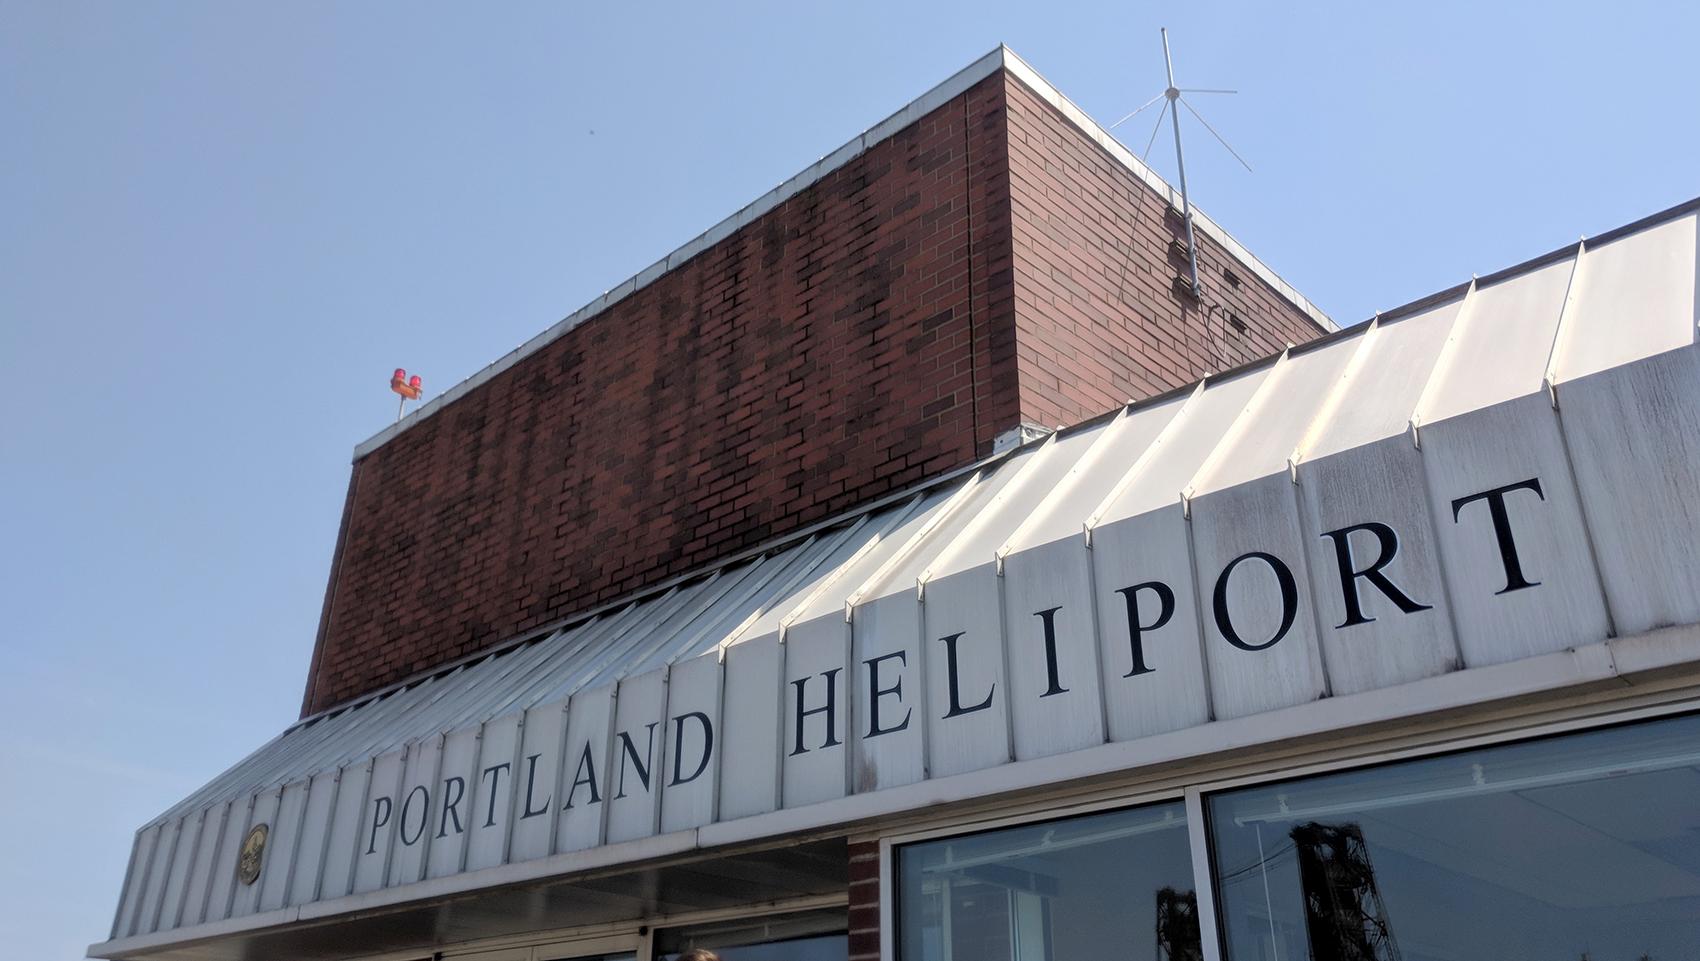 Portland-Heliport-sign.jpg